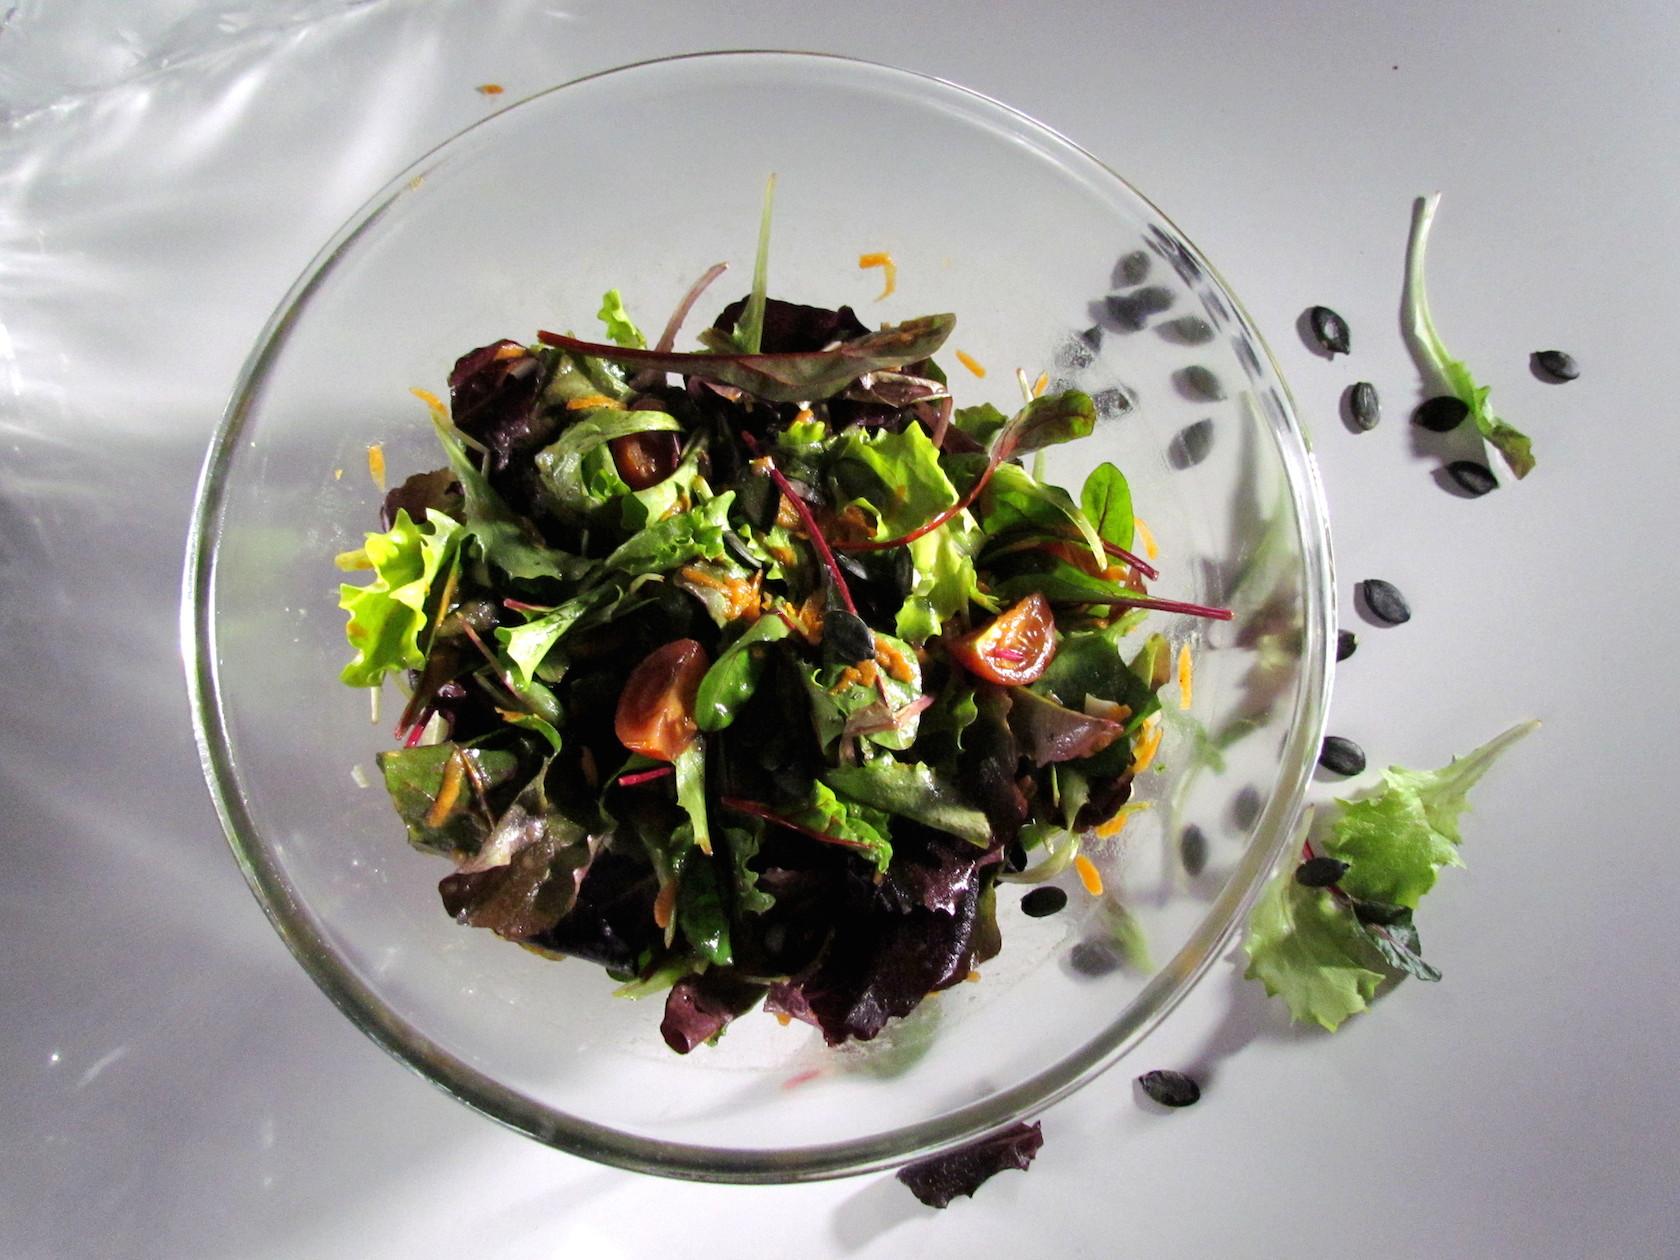 salade verte avec une vinaigrette à l'orange | www.savormania.com